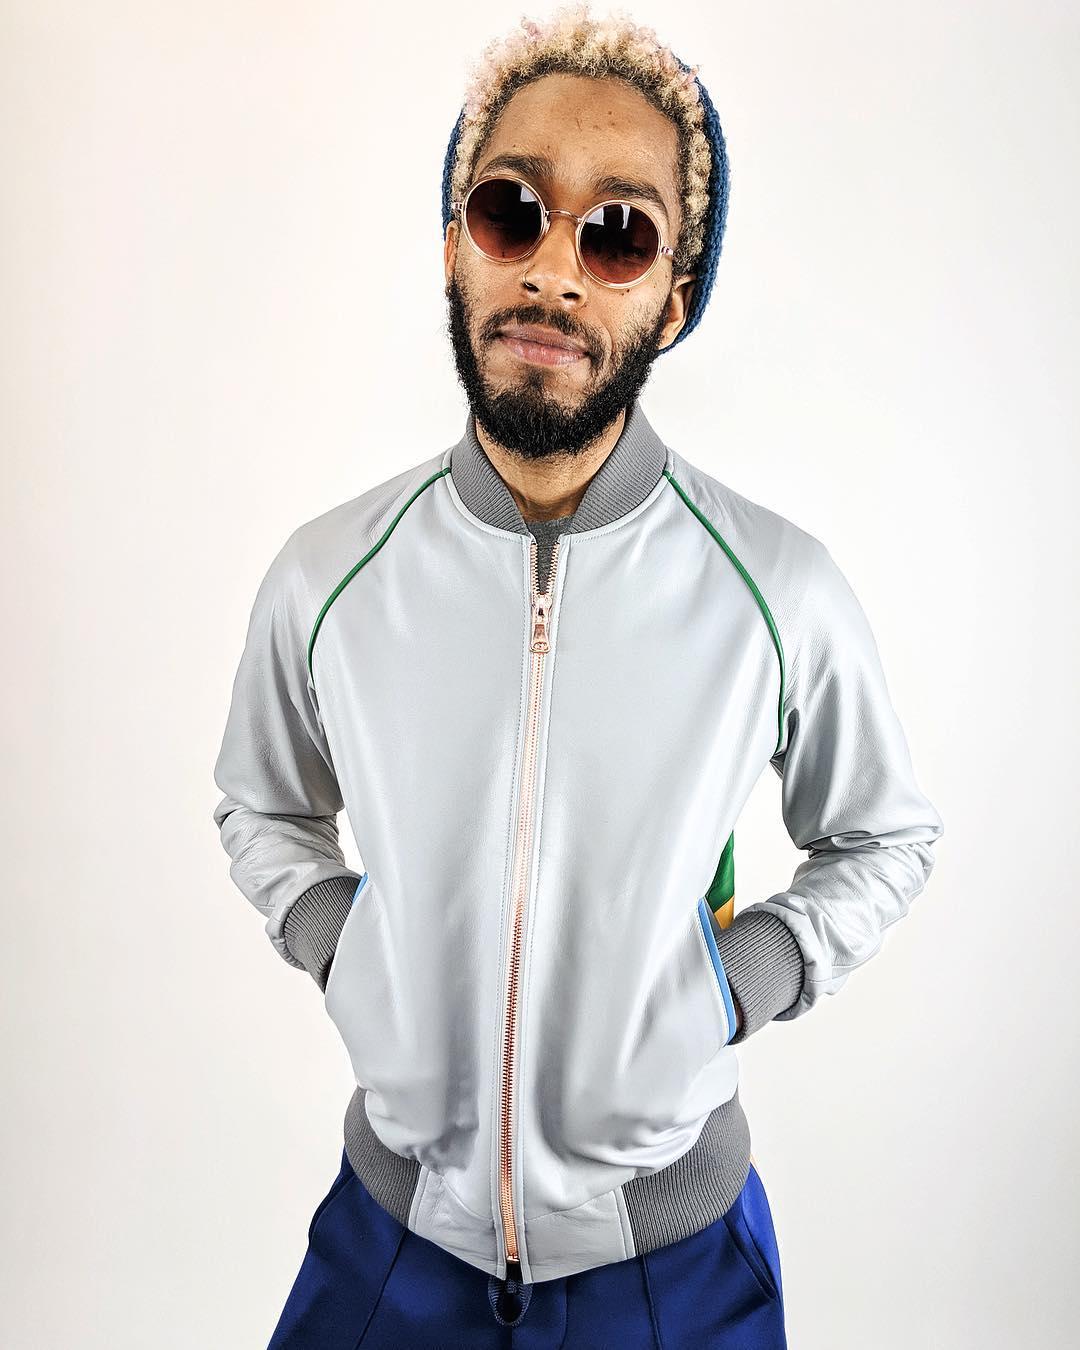 Celebrity tailor Fresh talks style, Draymond Green, Joel